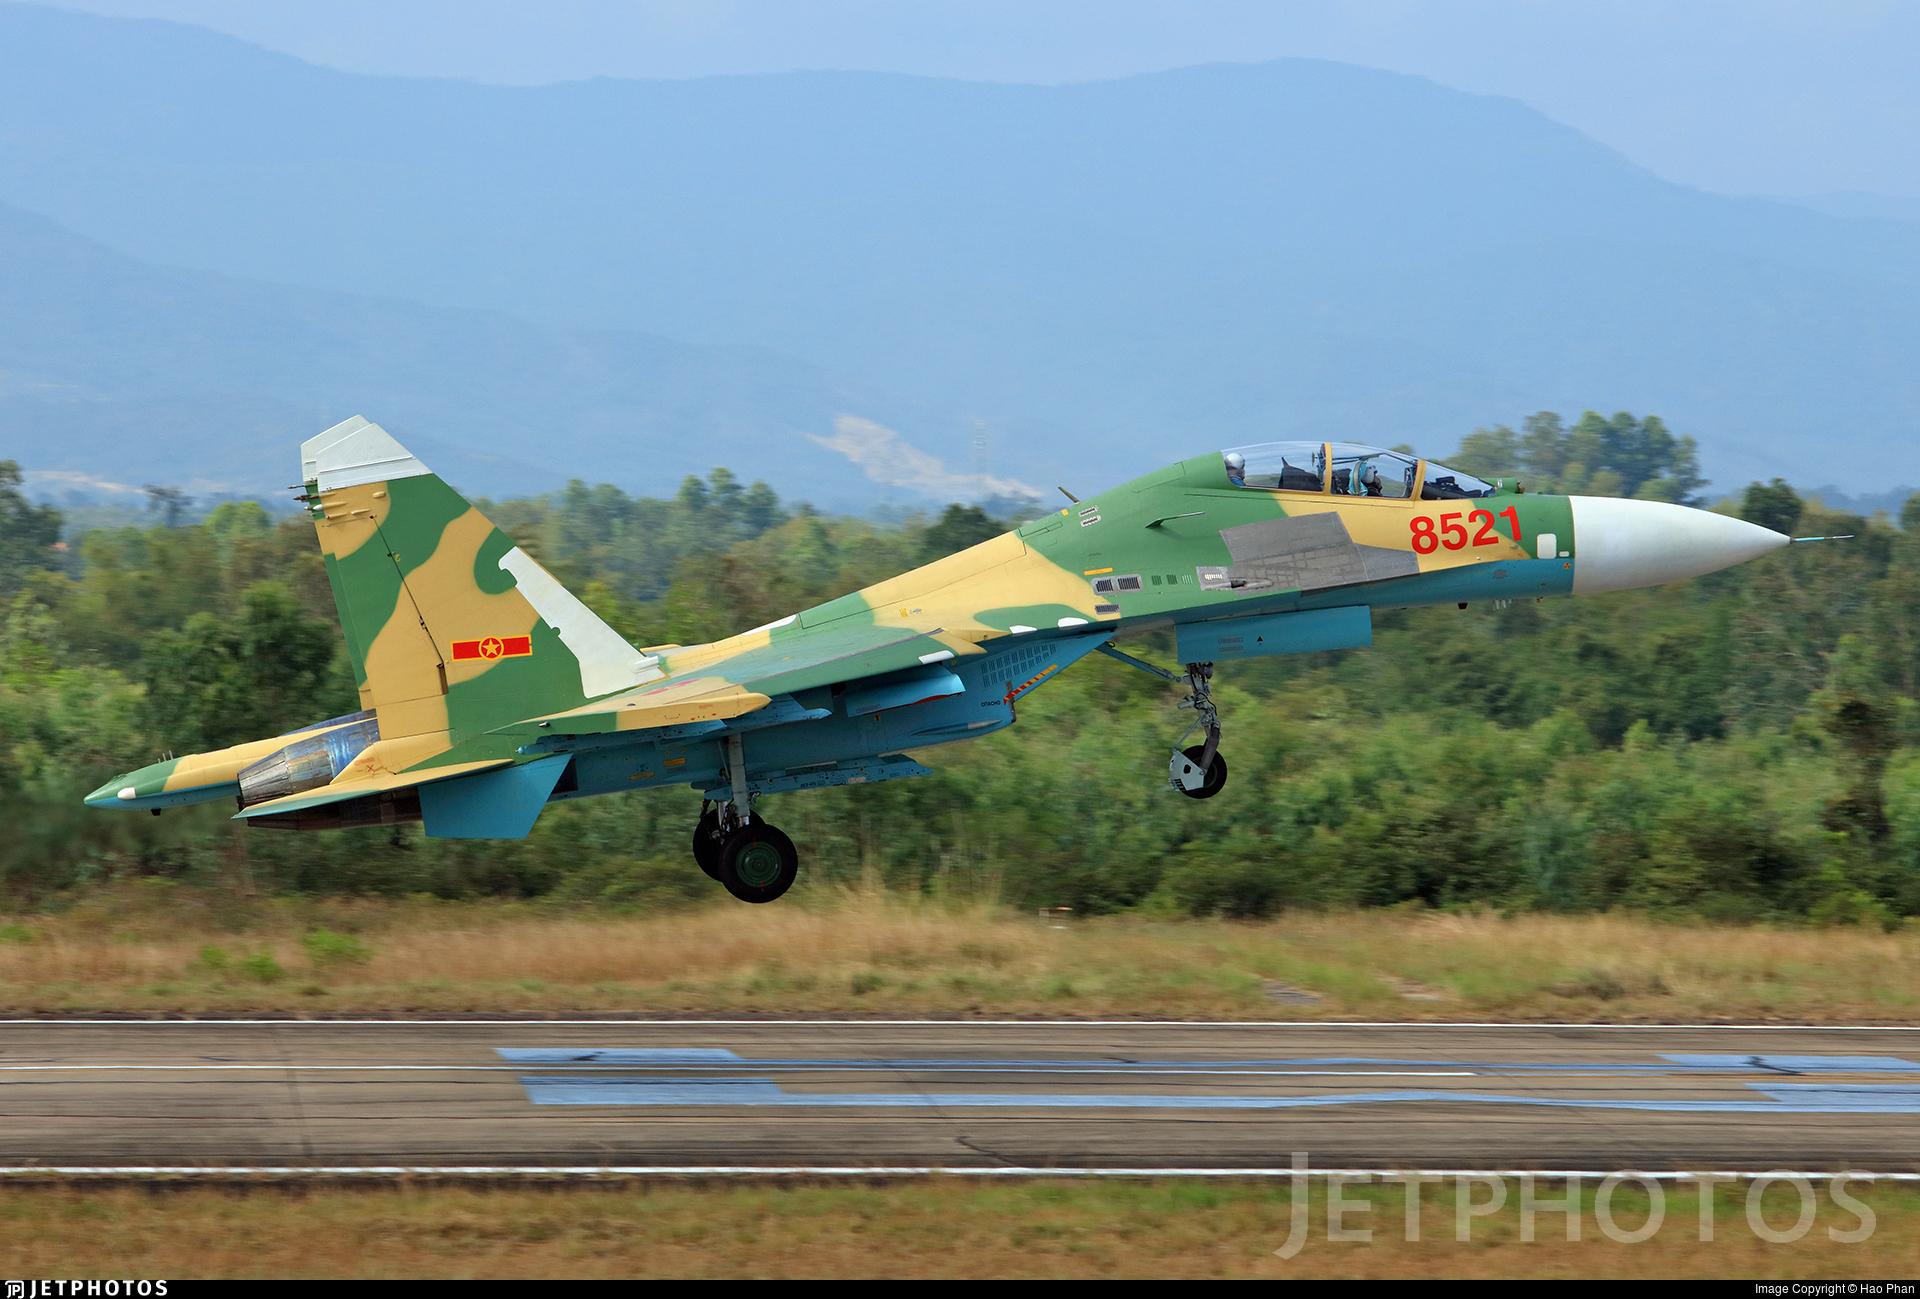 8521 - Sukhoi Su-27UB Flanker C - Vietnam - Air Force